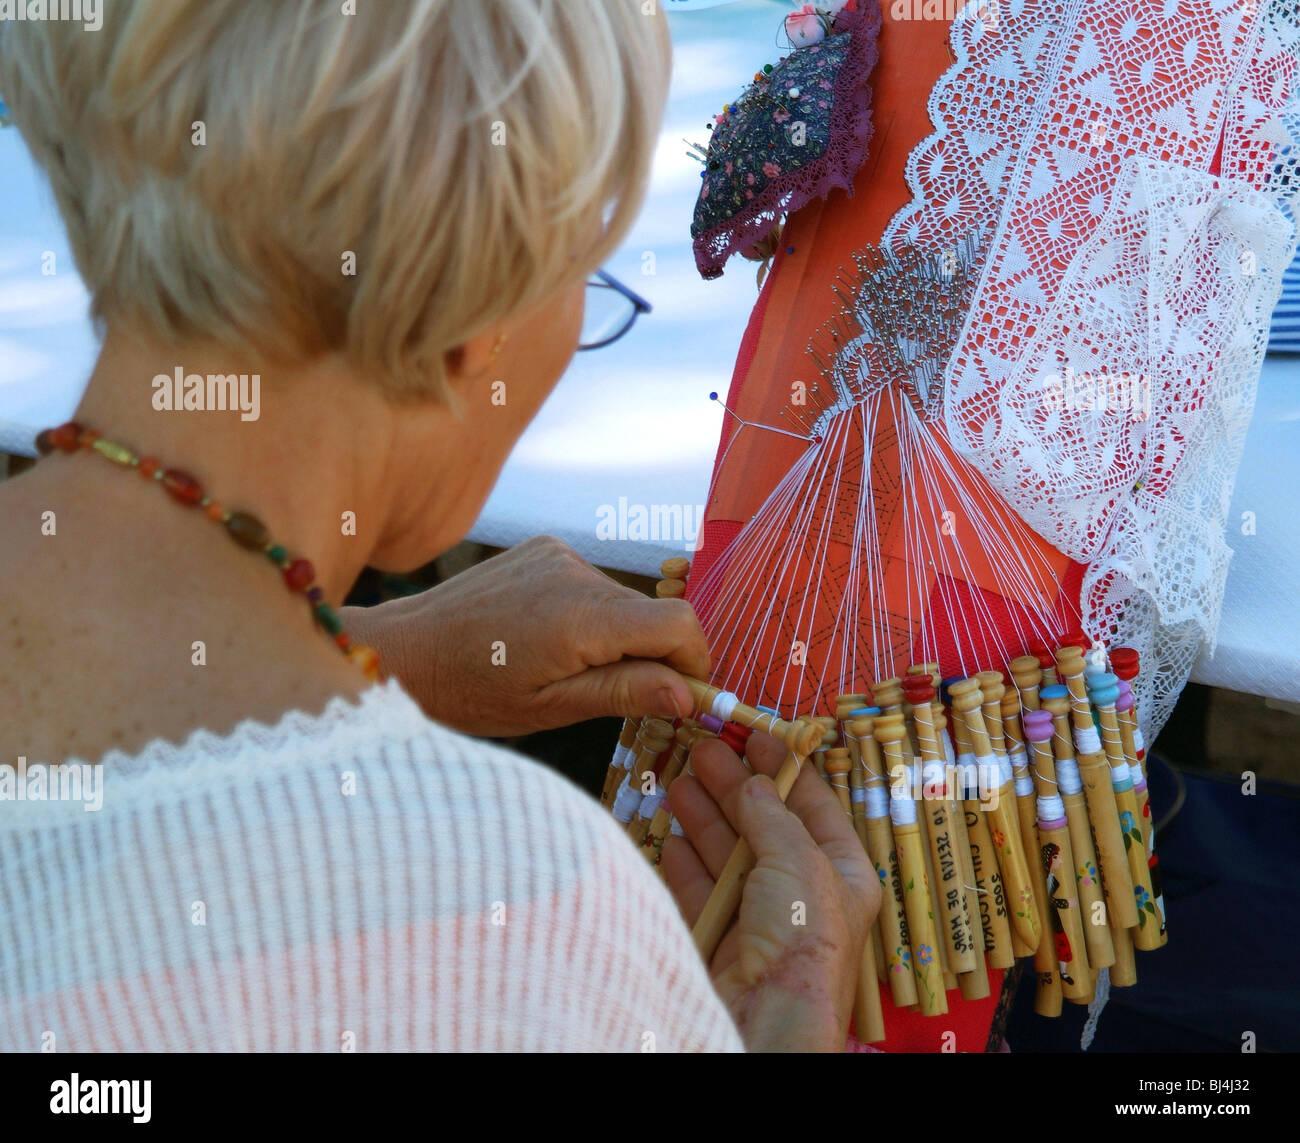 Woman making bobbin lace. - Stock Image